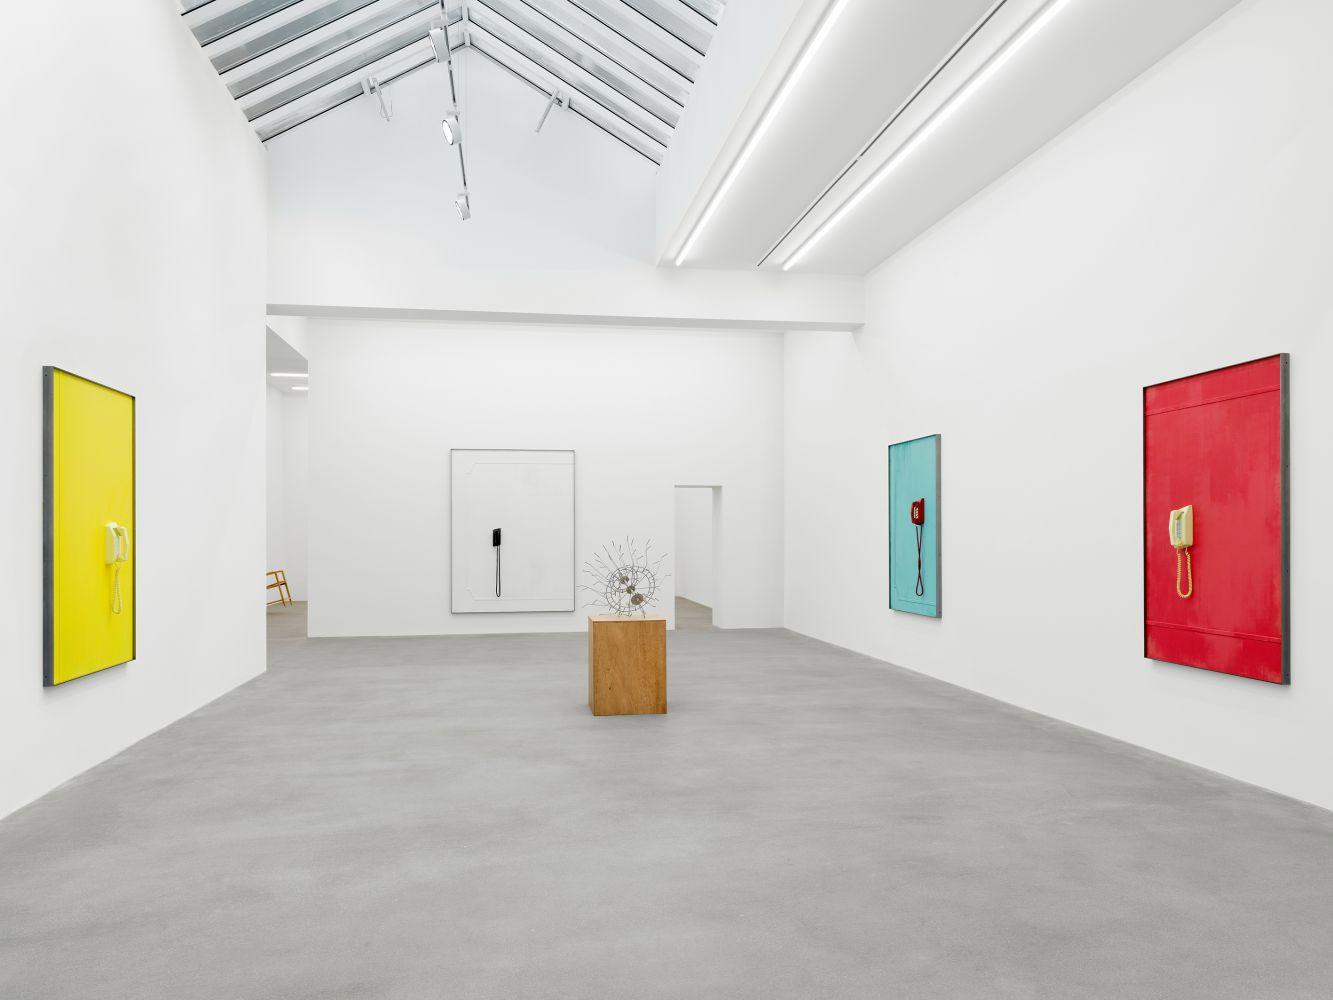 Exhibition View, Martin Boyce, No Longer Fathom, Galerie Eva Presenhuber, Zurich 2020 install 1